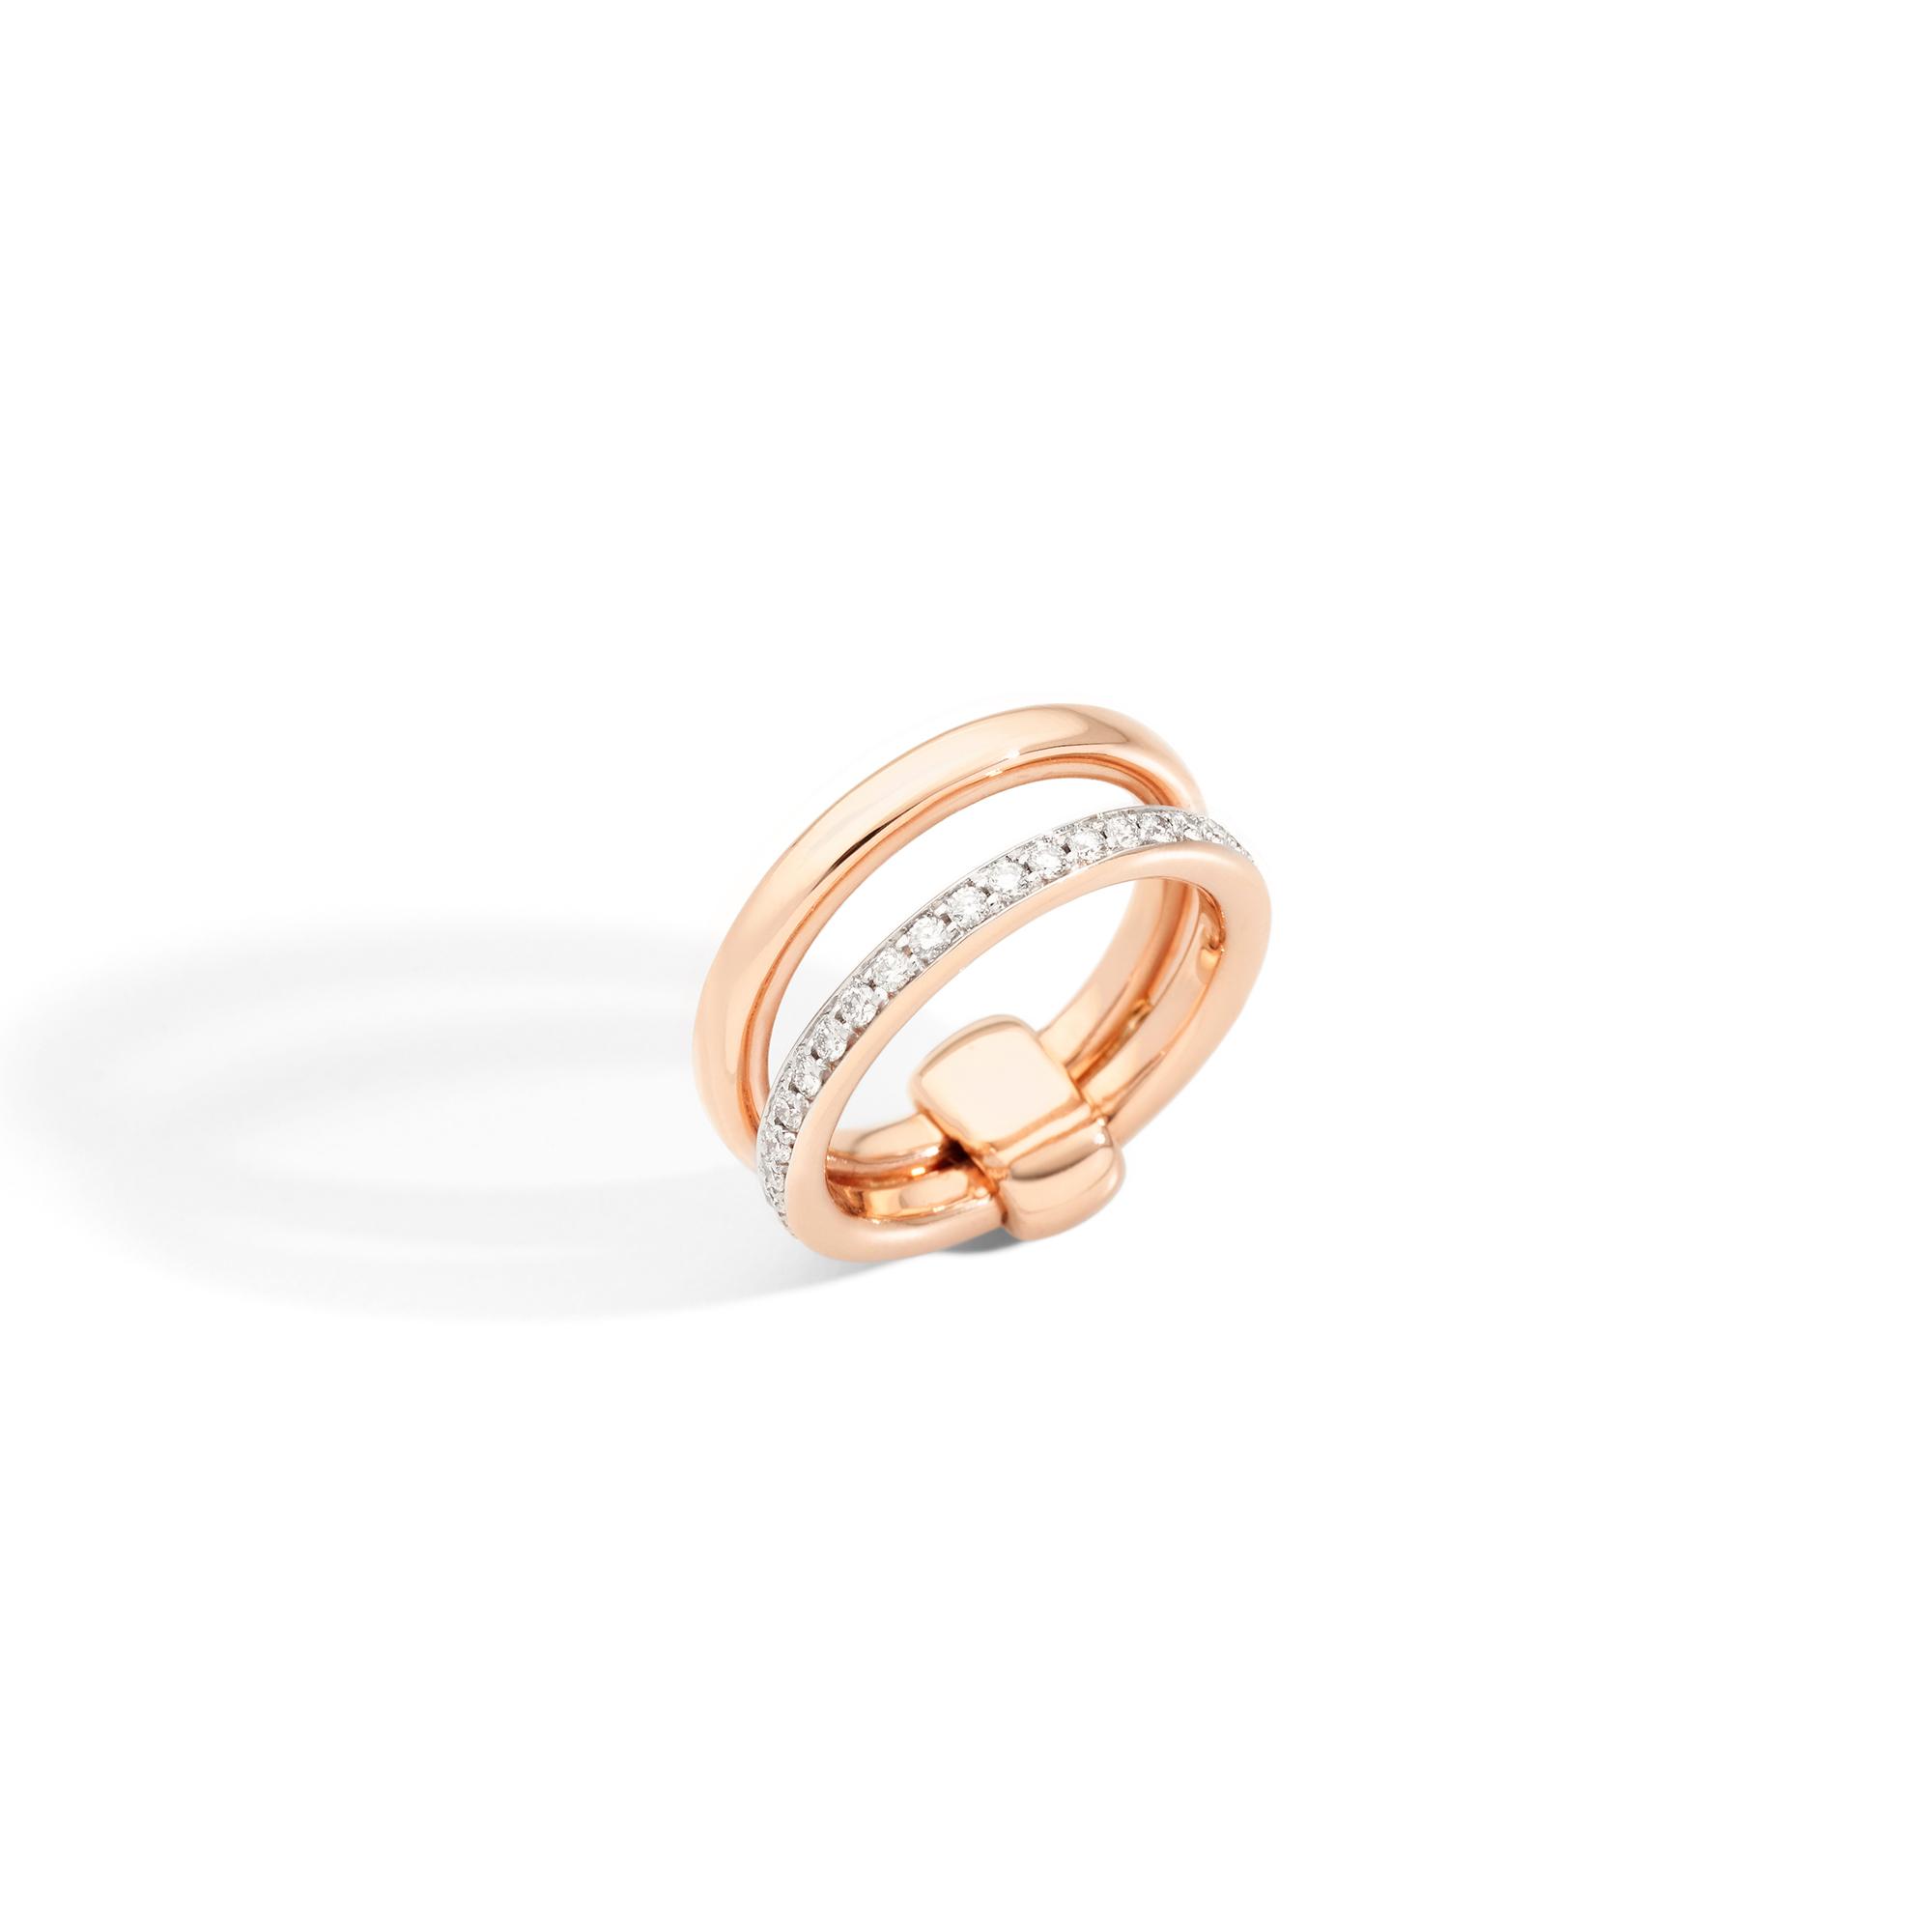 Pomellato Iconica Ring aus Roségold mit Brillanten